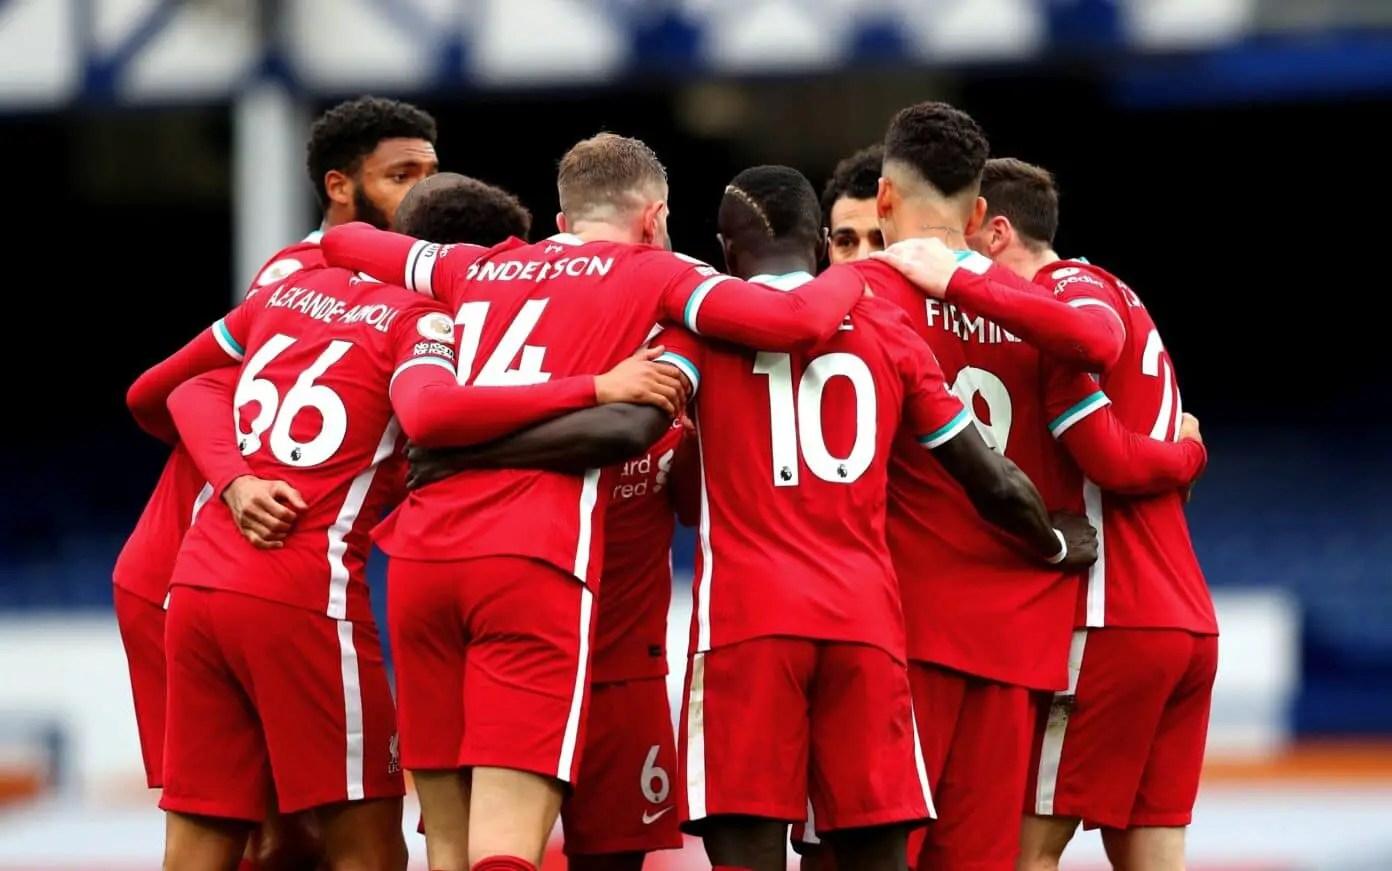 Everton 2-2 Liverpool – VAR denies Reds & Henderson dramatic late victory